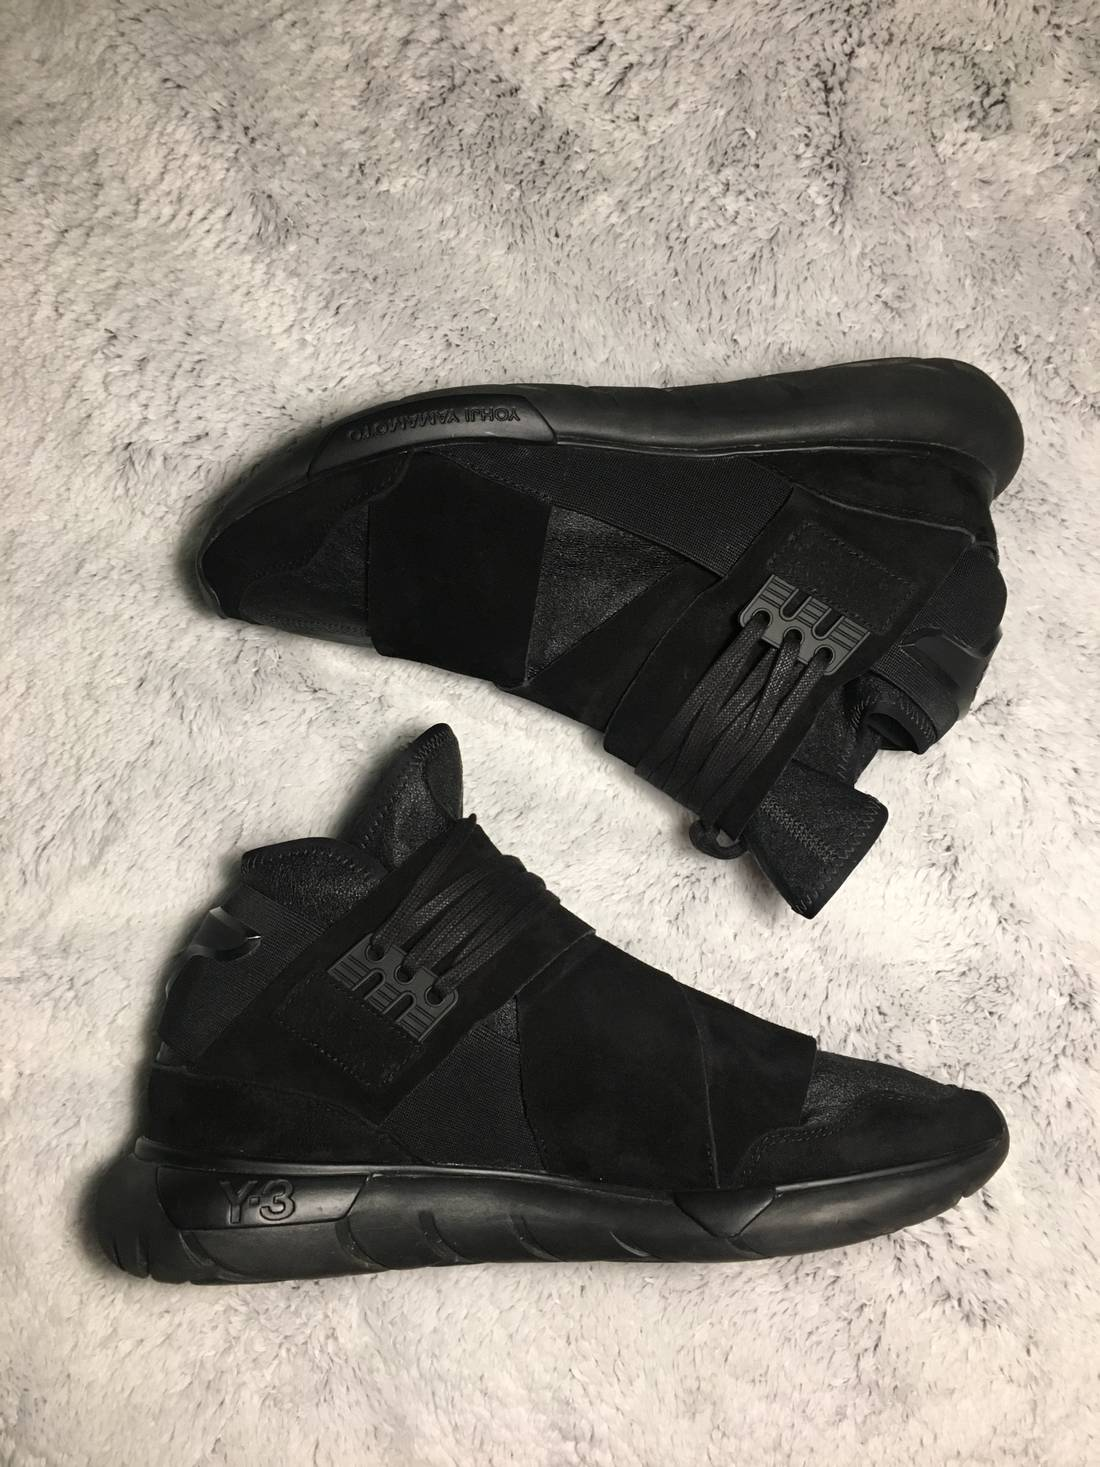 5087eff7e ayero low top sneakers  y 3 y 3 qasa high lux triple black used adidas size  us 11